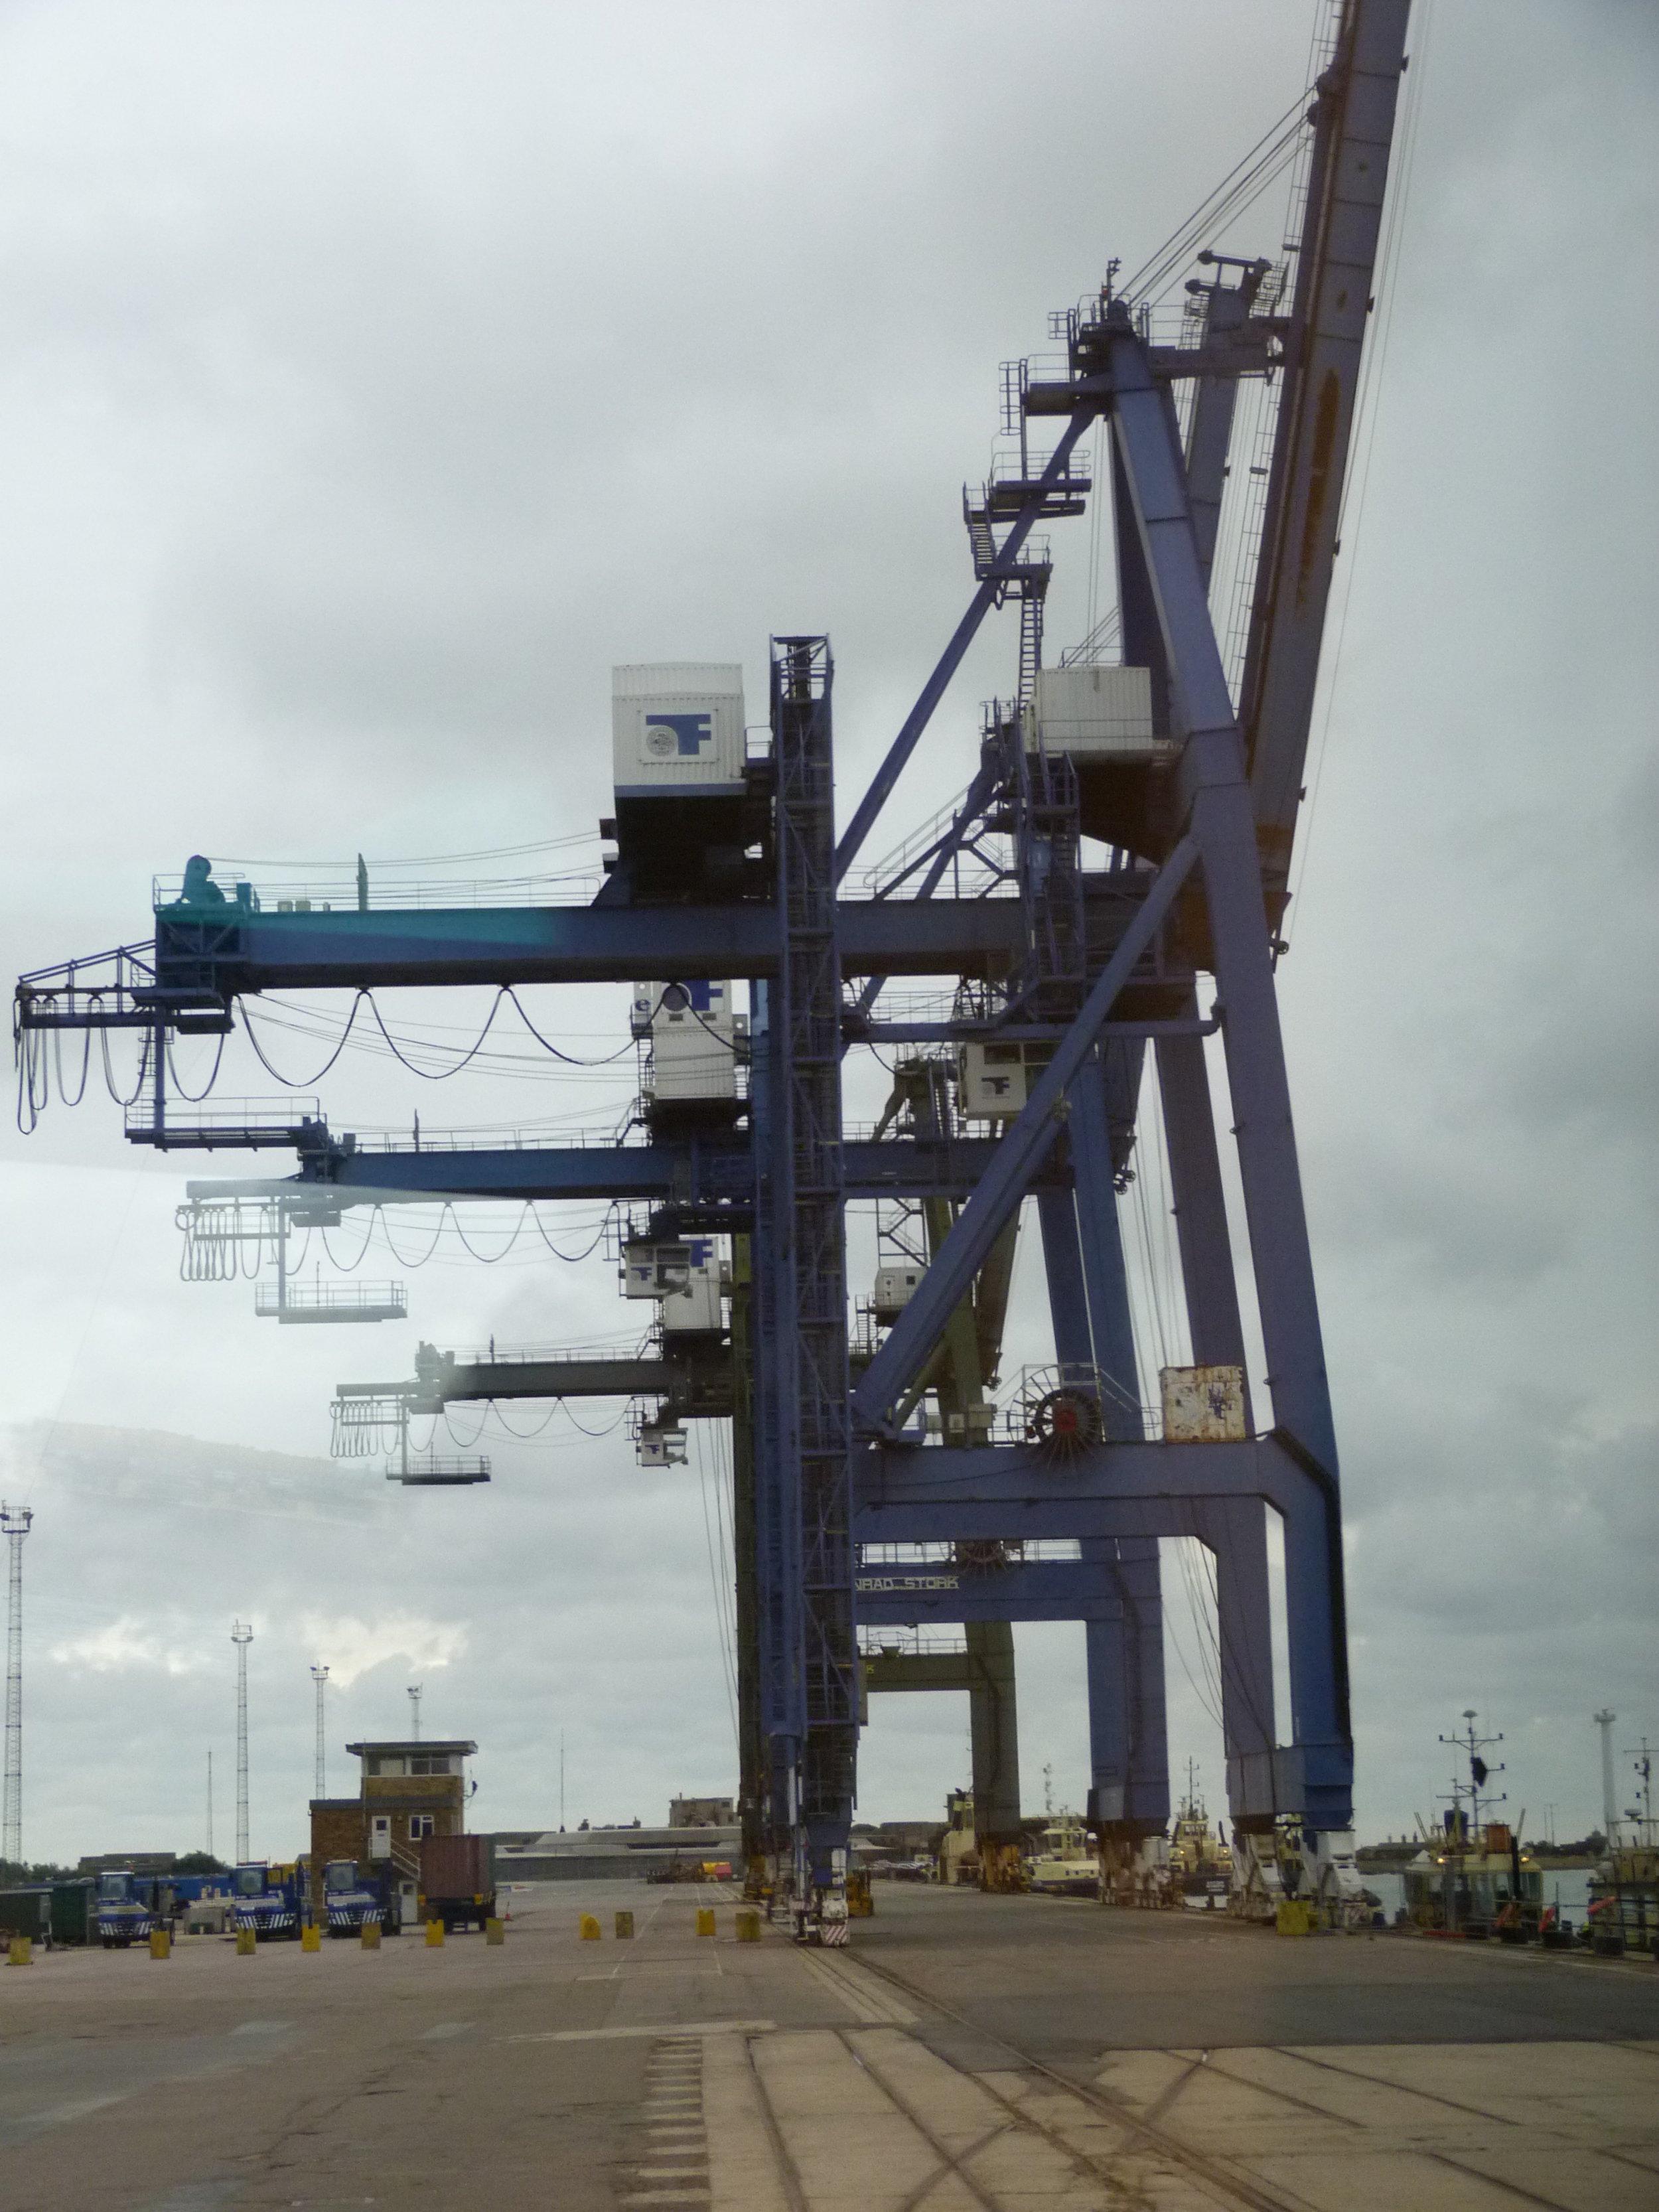 Port of Felixstowe Old-Redundant Cranes P1040023.JPG